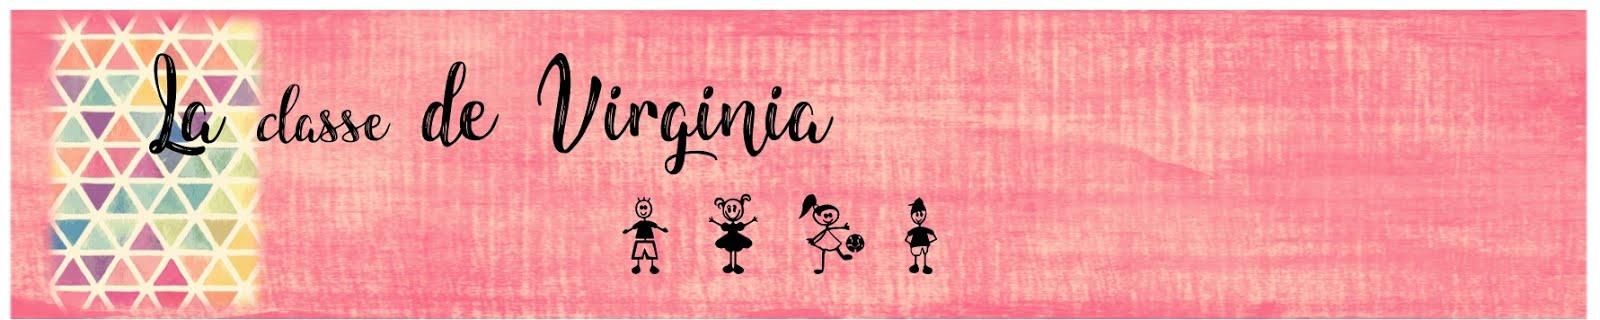 La classe de Virginia